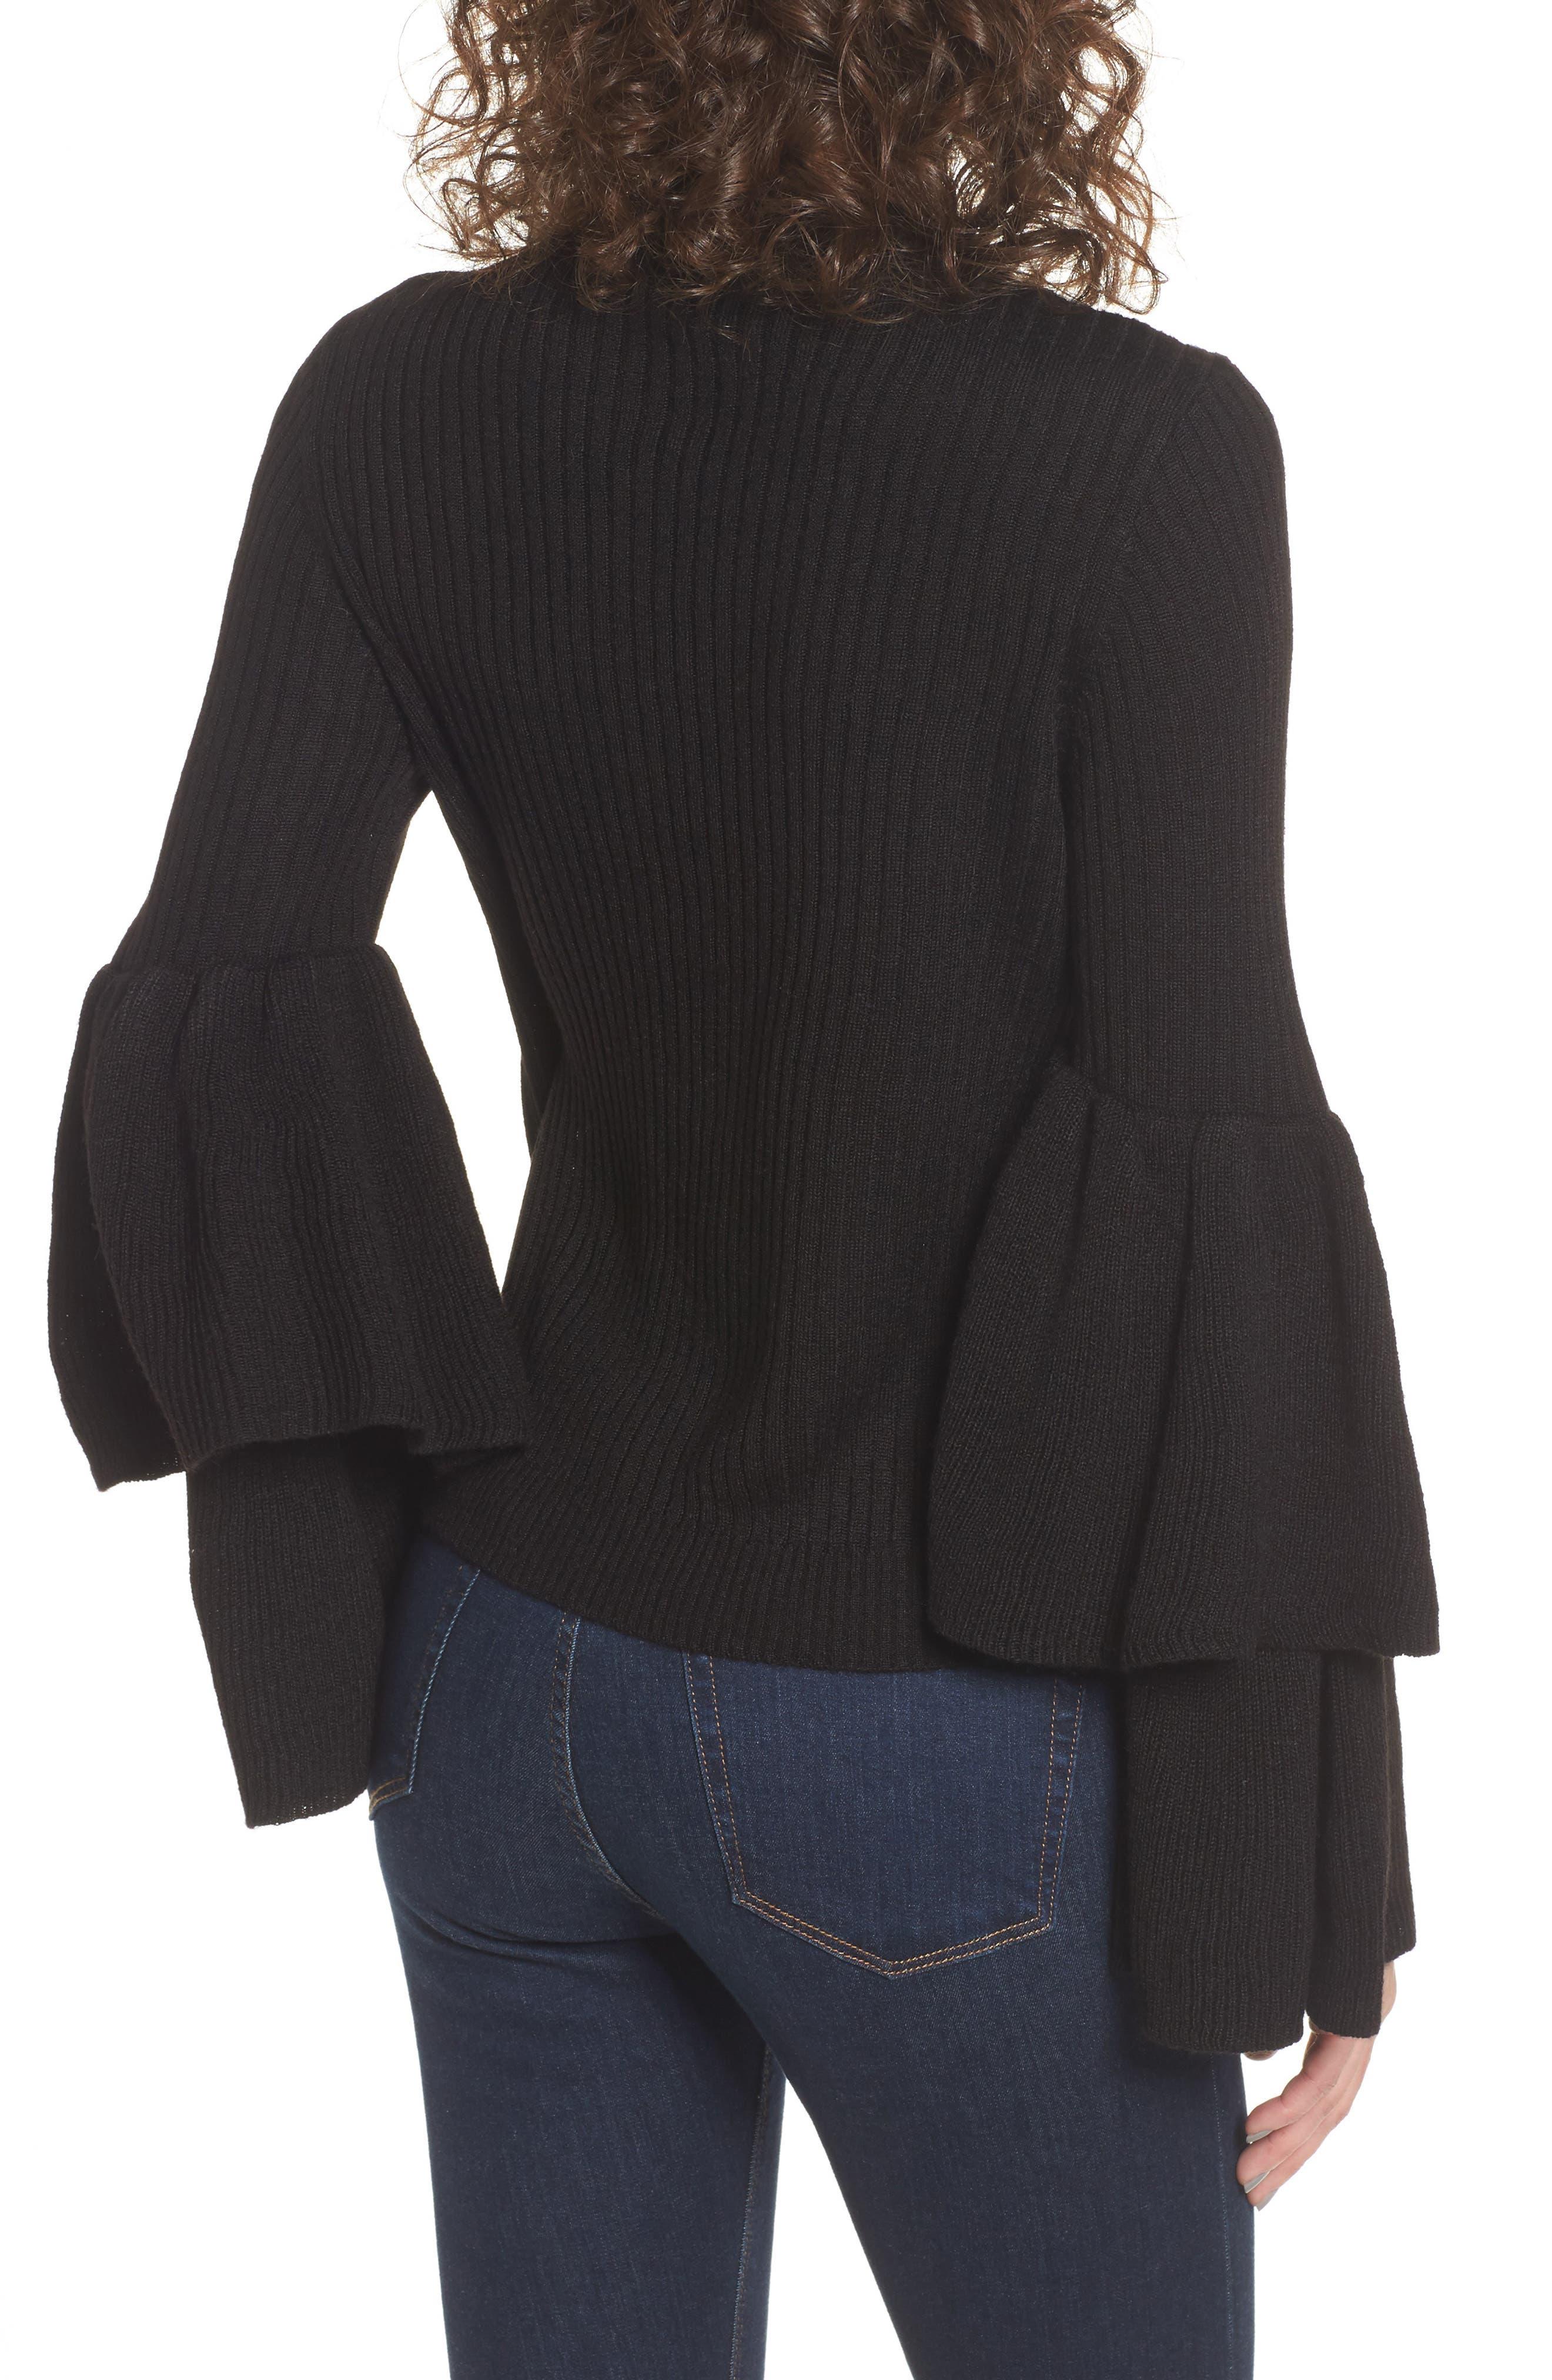 Tiara Bell Sleeve Sweater,                             Alternate thumbnail 2, color,                             001